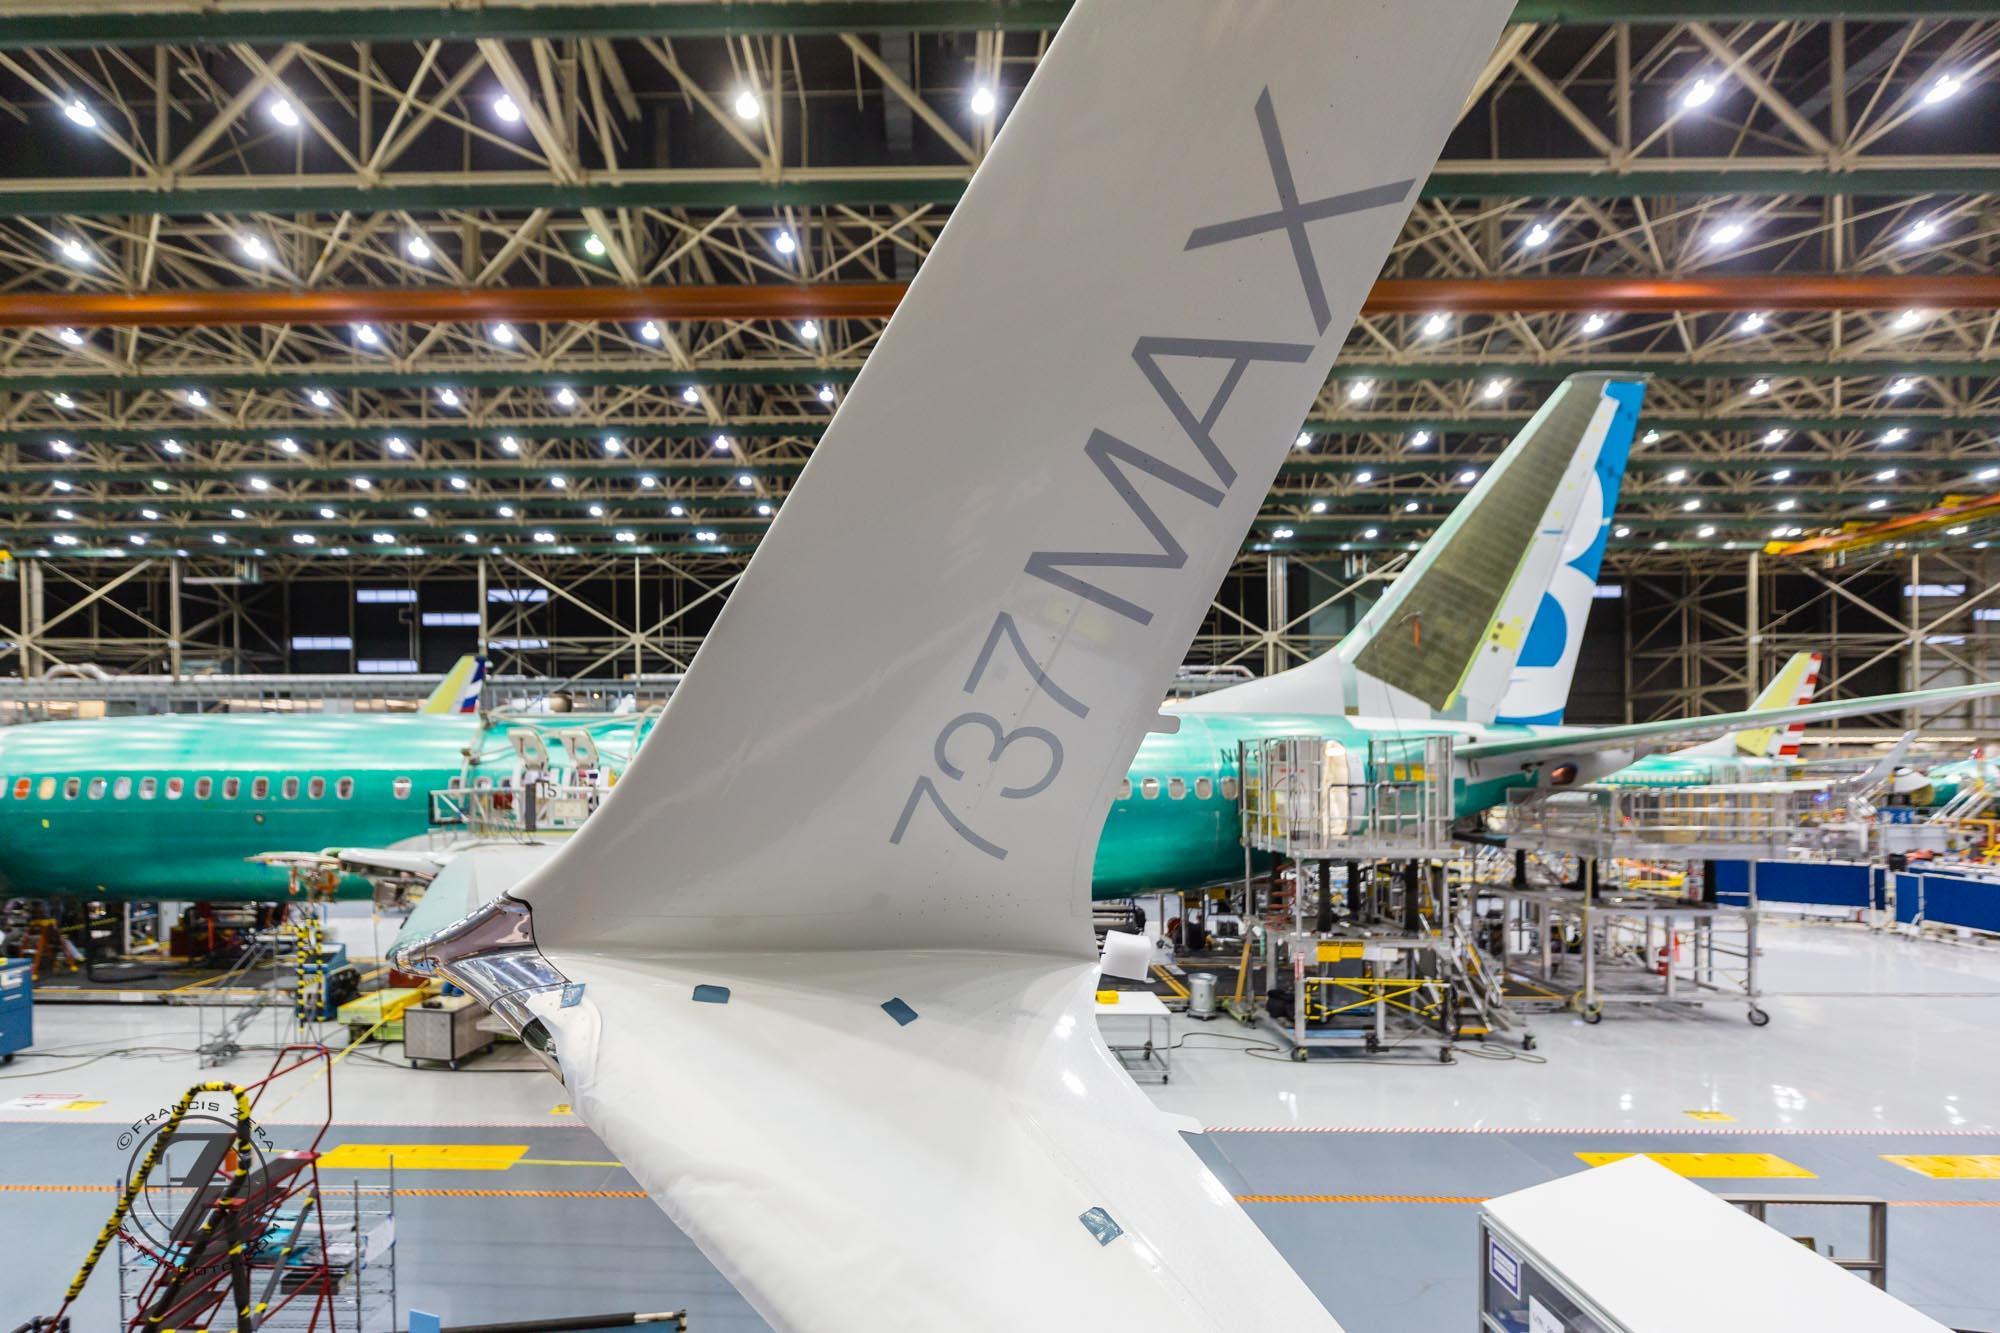 Resultado de imagen para Boeing 737 max assembly line